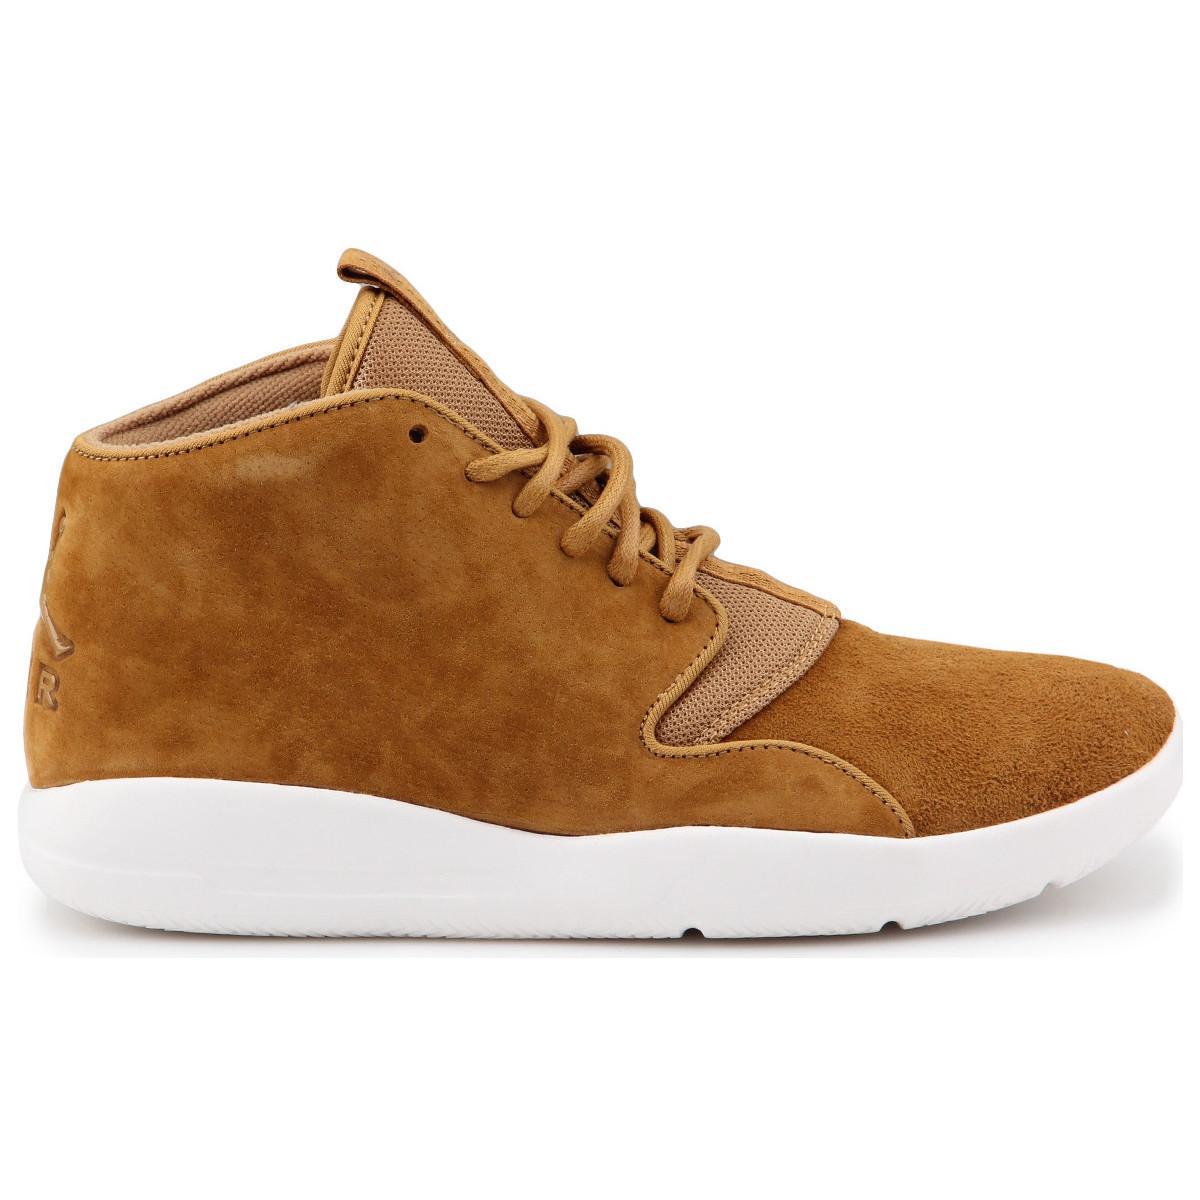 7c7fbc42ce4 ... Jordan Eclipse Chukka Lea Aa1274 731 Men's Shoes (high-top Trainers).  Visit Spartoo. Tap to visit site